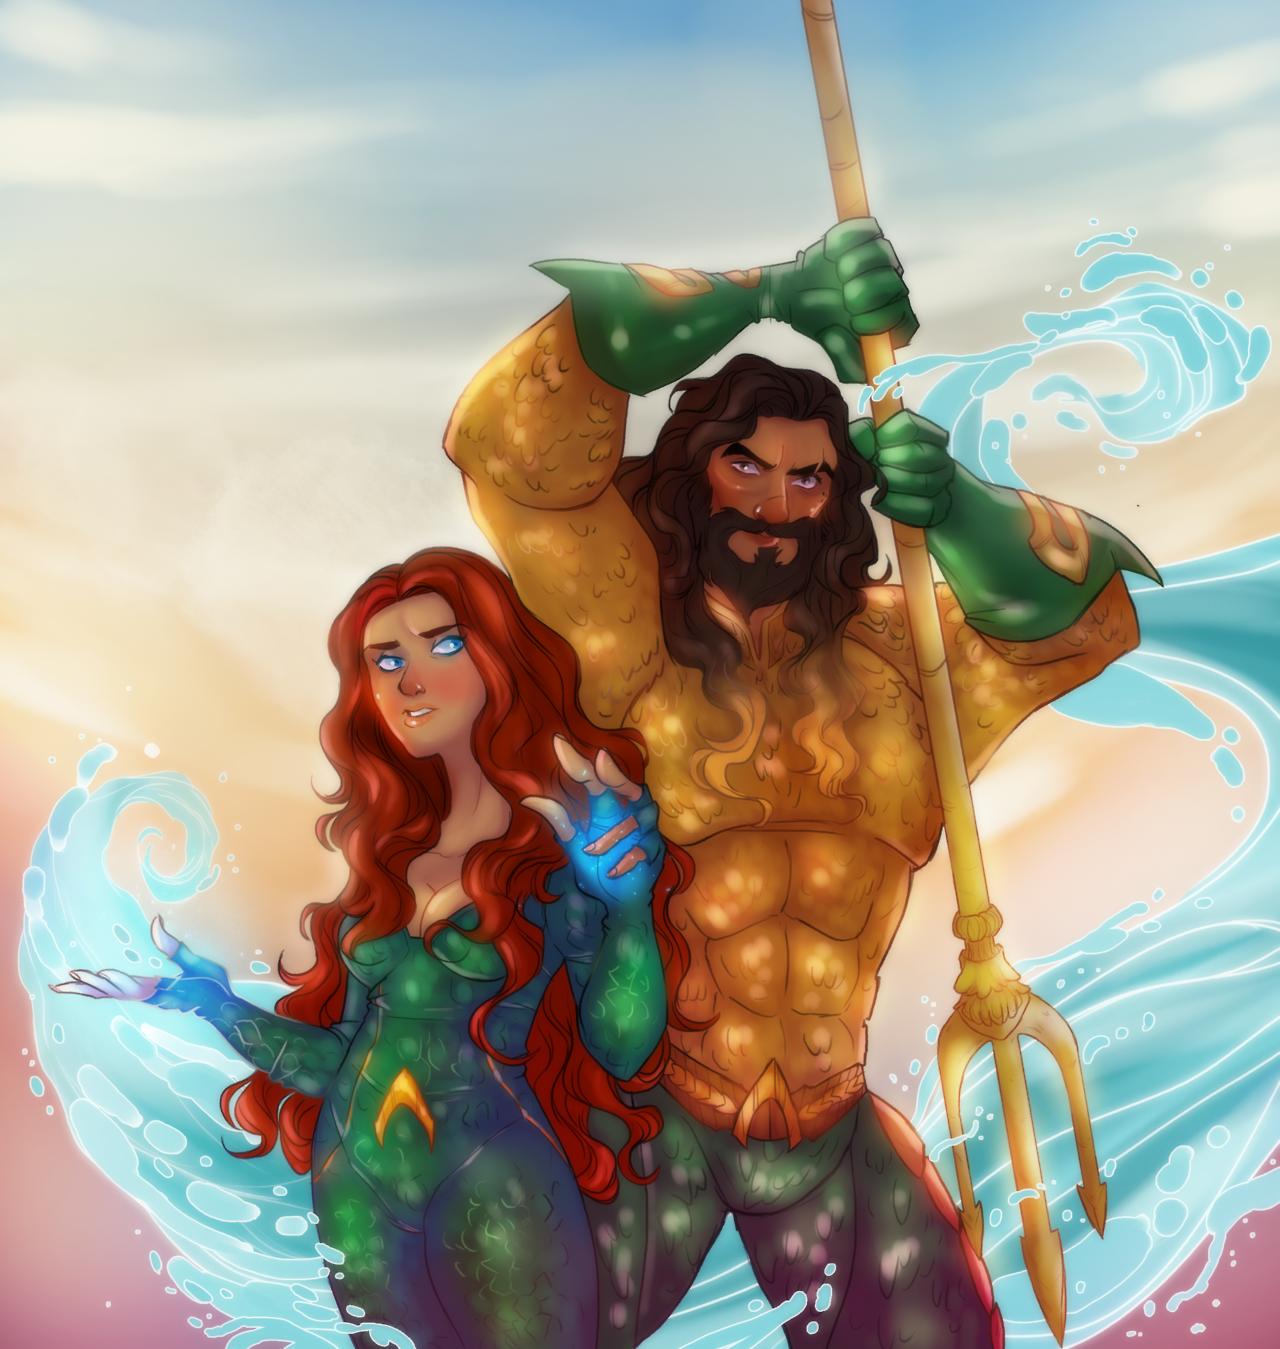 Aquaman Jason Momoa Mera Aquaman S Wifey Amber Heard: Aquaman Arthur Curry Mera Amber Heard Queen Mera Jason